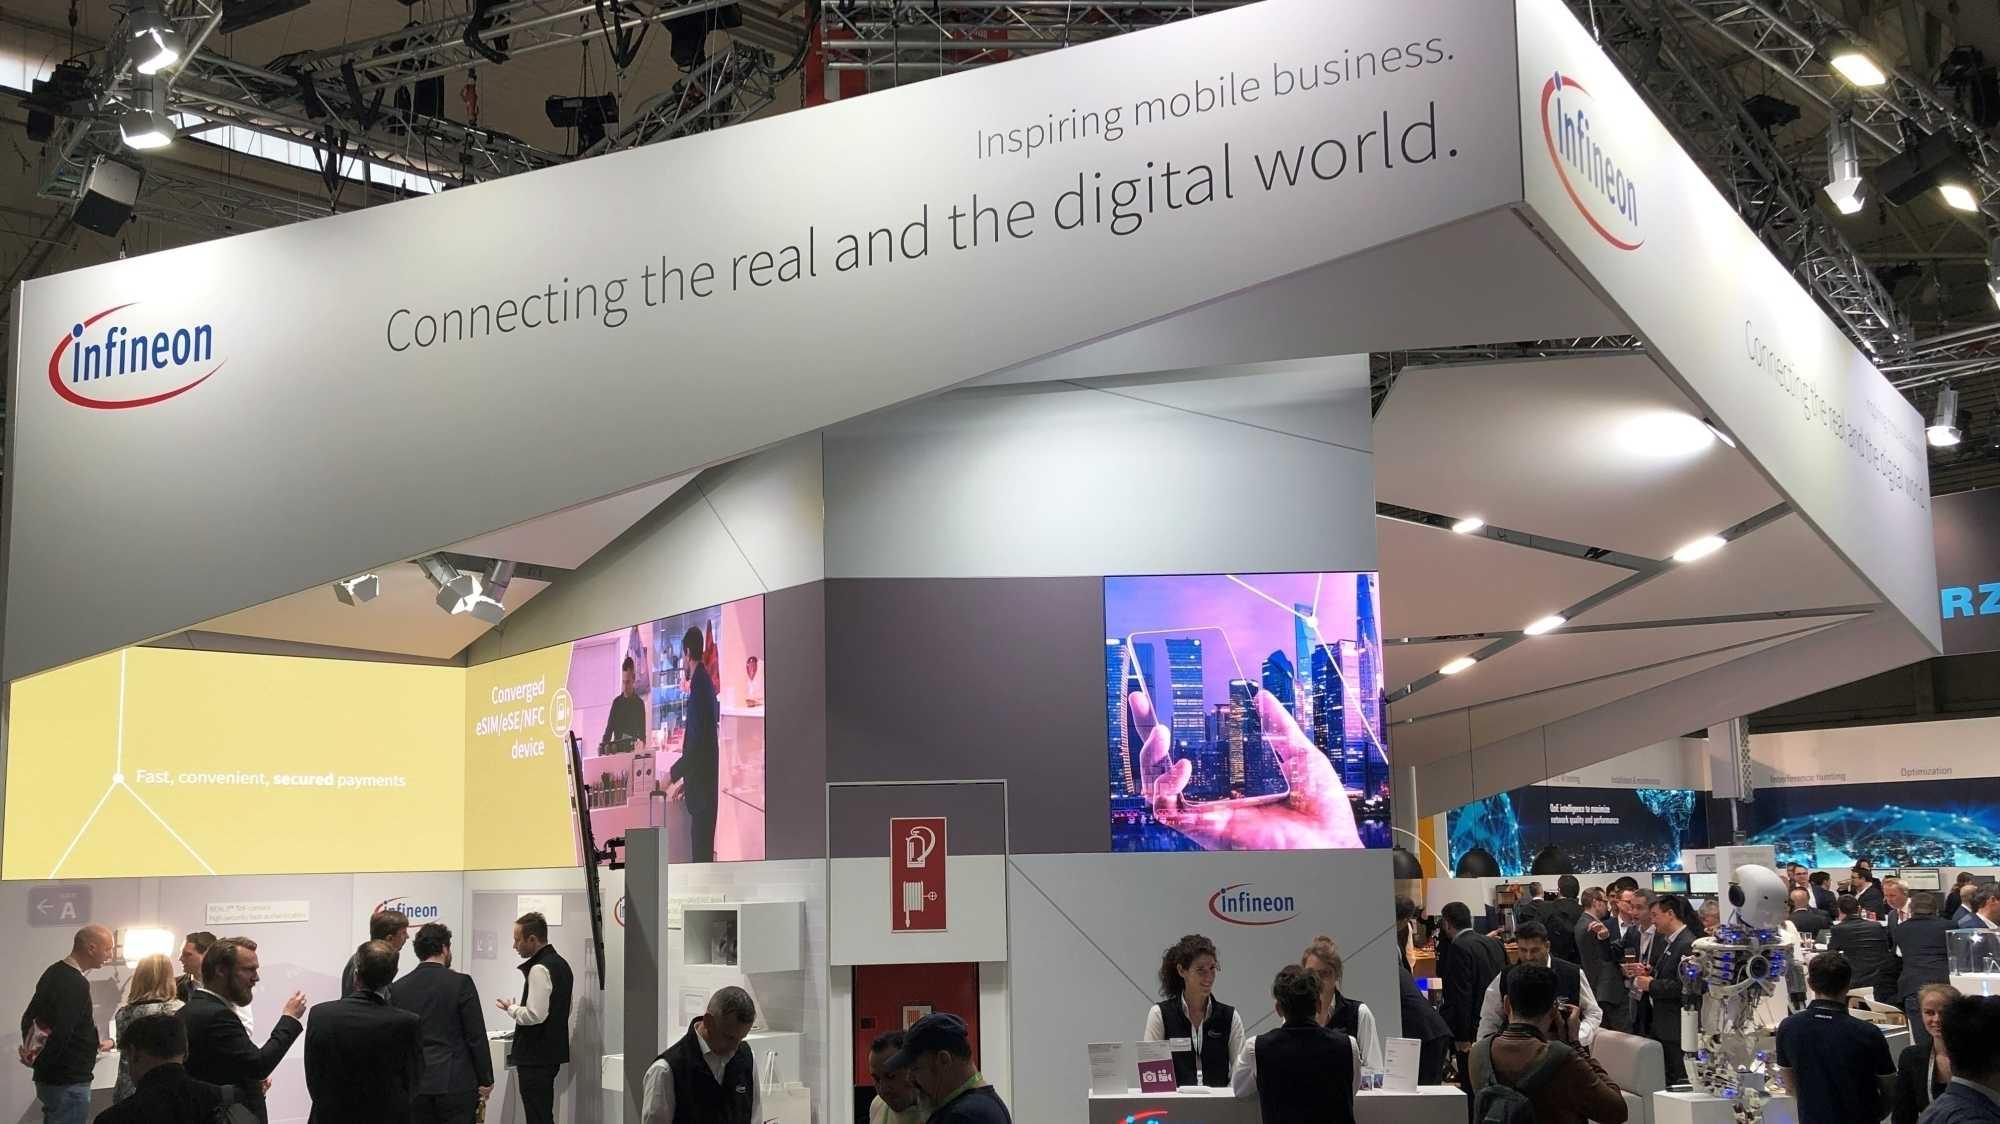 Auch Infineon kappt angeblich Geschäftsbeziehungen zu Huawei